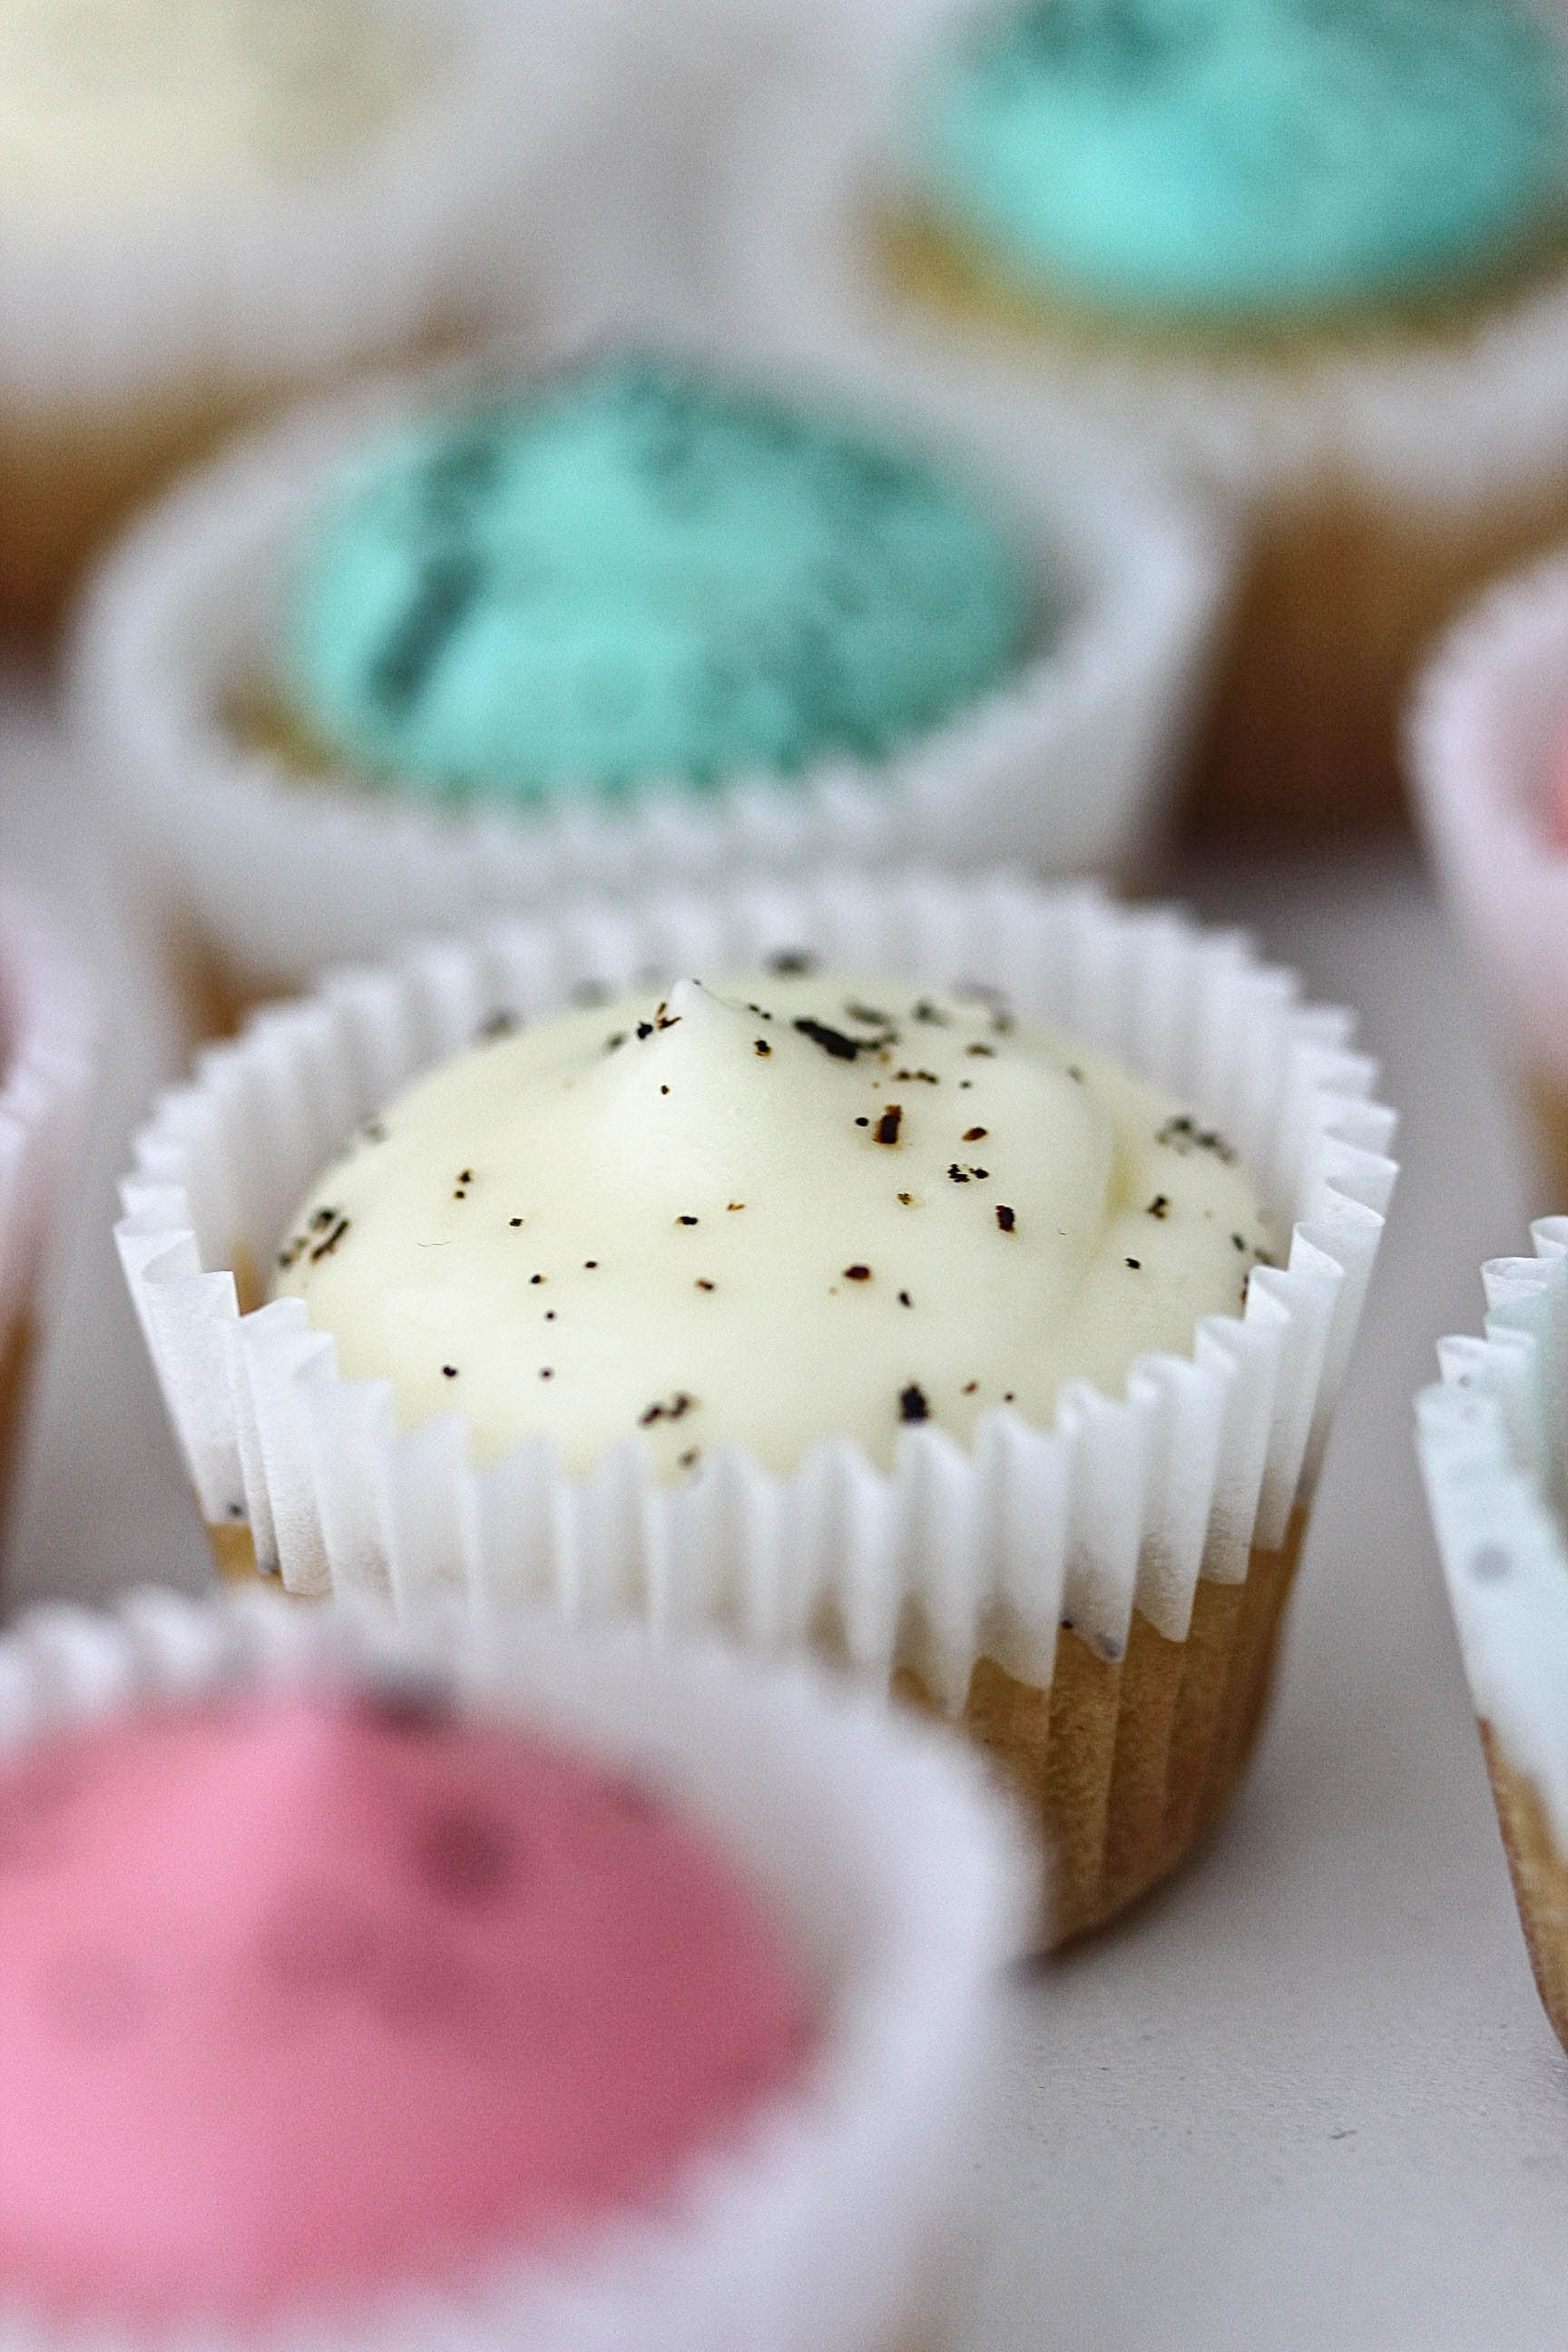 Süße Mini Vanille Cupcakes mit pastelligem Frosting Rezept Ostern Babyparty Babyshower Kindergeburtstag backen #cupcakes #ostern #babyshower #kindergeburtstag Backblog Foodfotografie Foodblog   Emma´s Lieblingsstücke